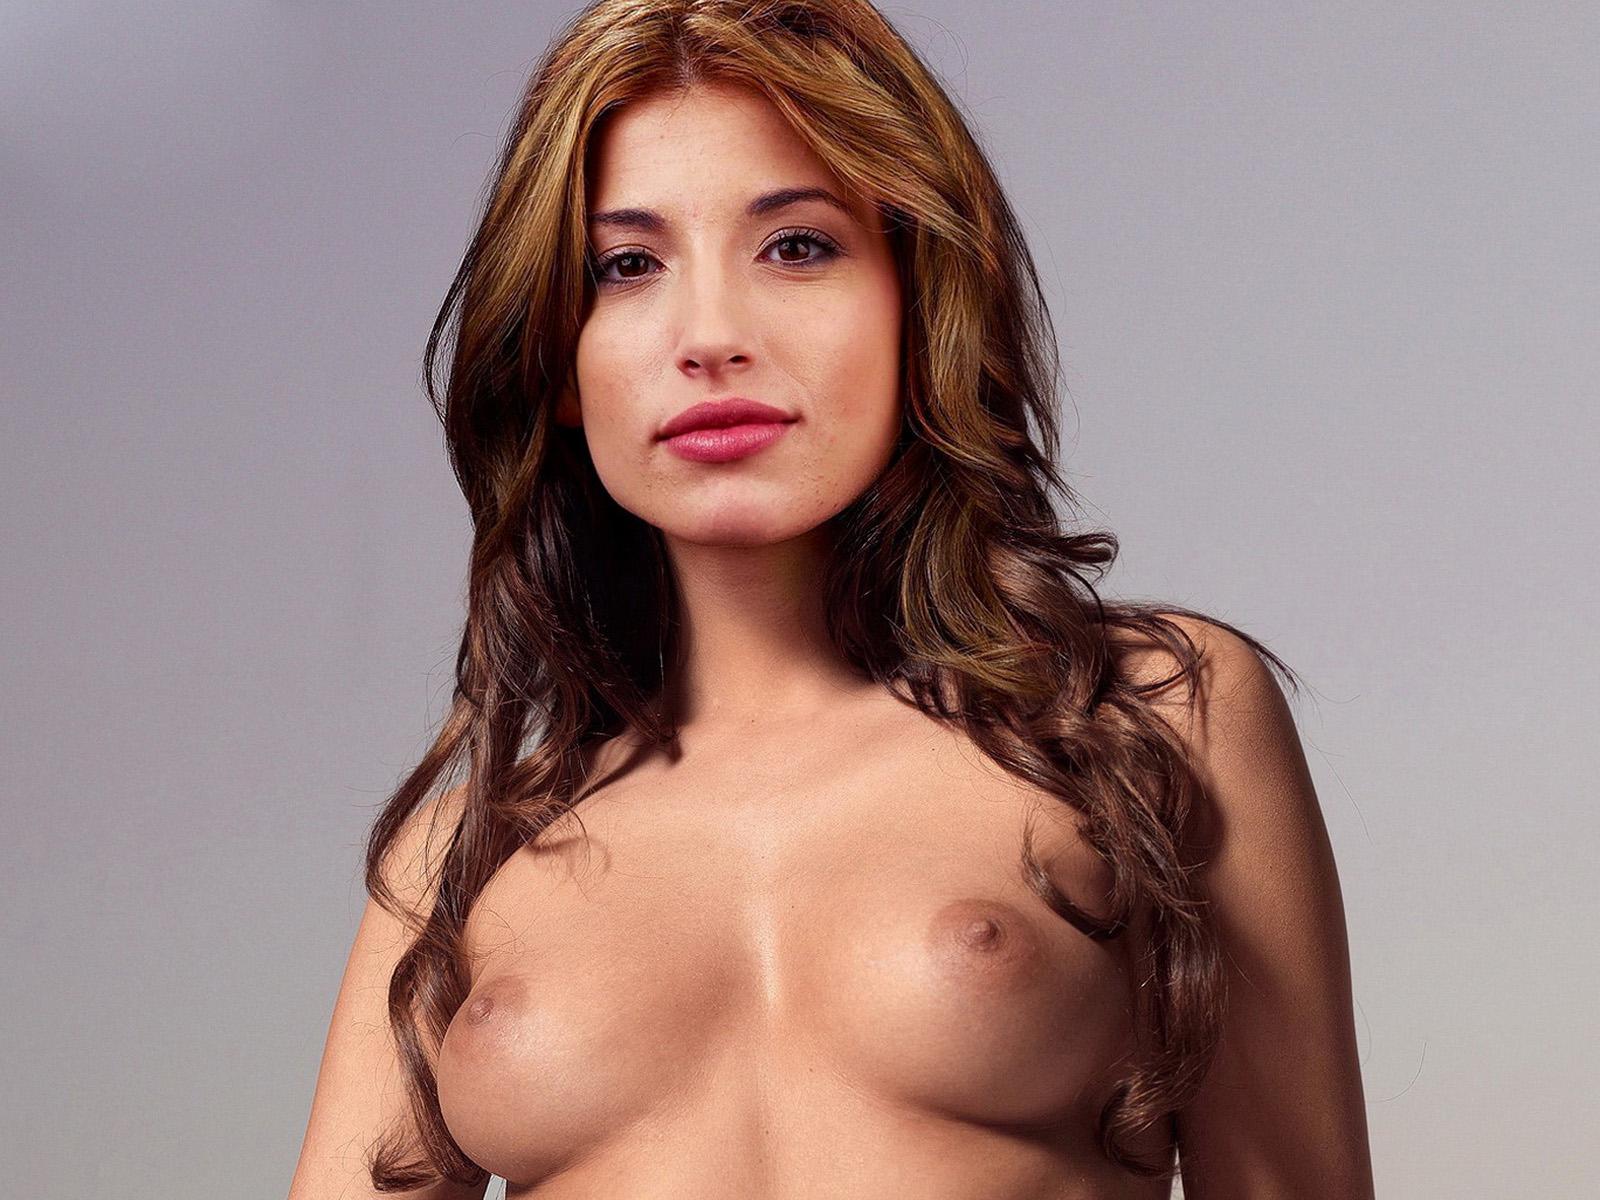 http://4.bp.blogspot.com/-wYEMxJnD3pI/T3F2gLlbiFI/AAAAAAAAABk/b94P_a0hDHY/s1600/Tania%2BRaymonte%2Bnude%2Bin%2BLost%2Bphotosession%2BUHQ.jpg